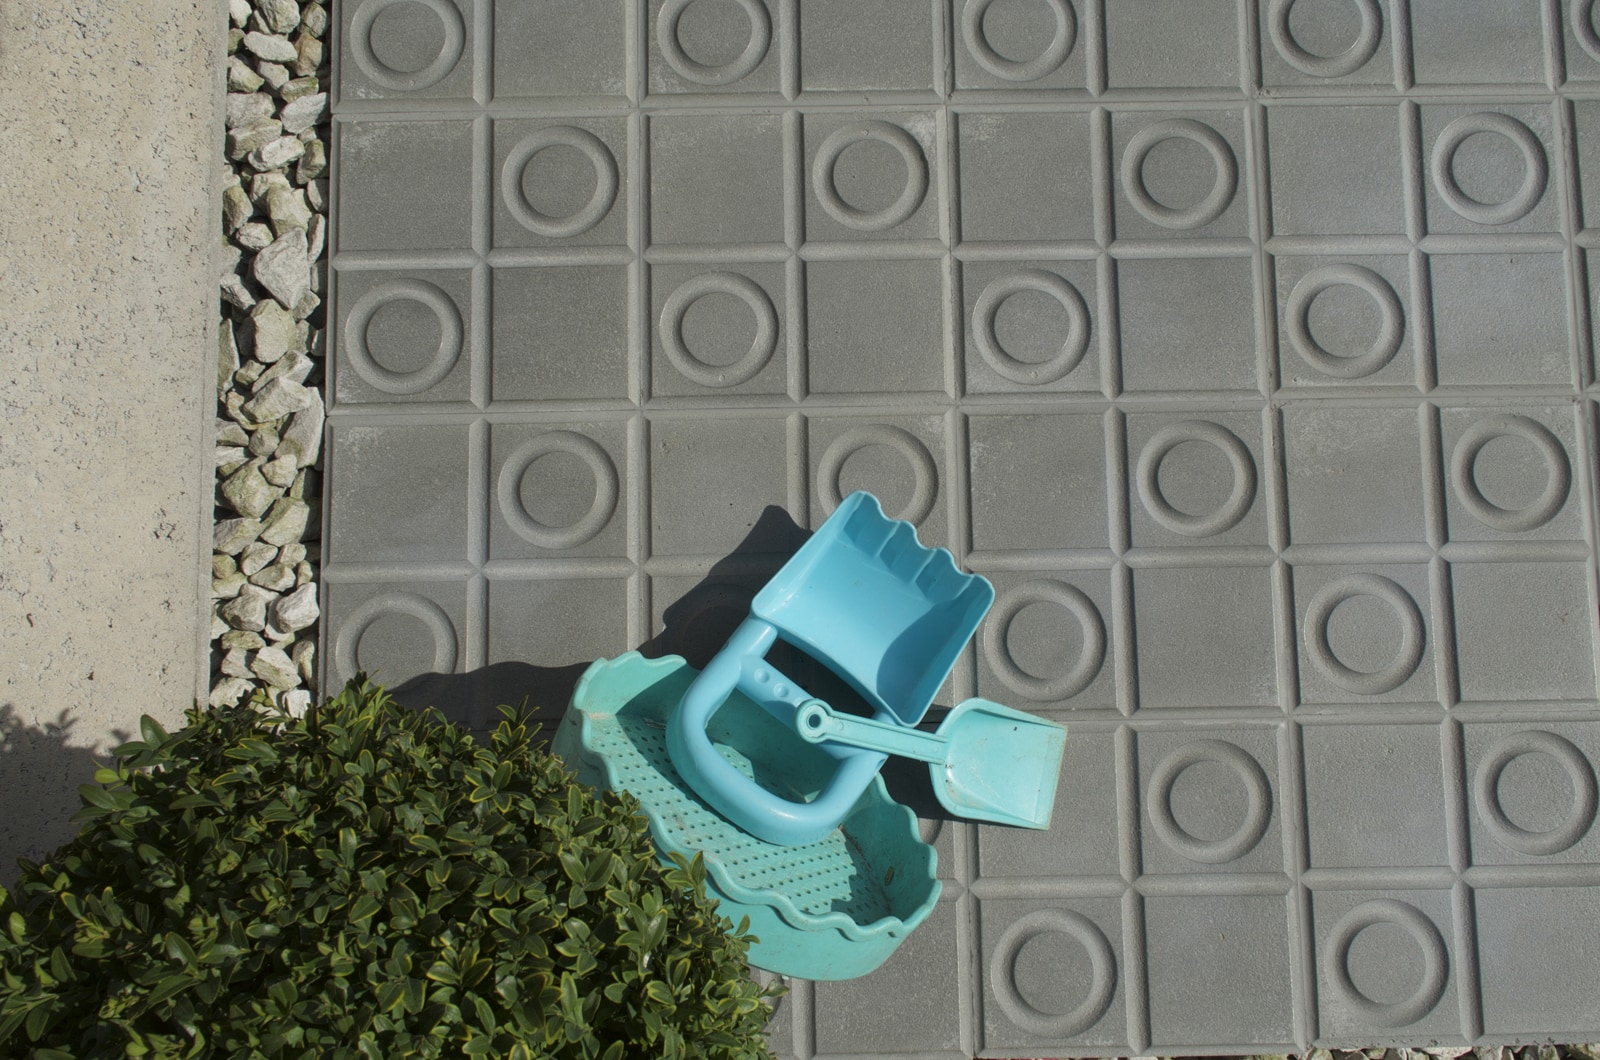 trottoirplatte-nummer-AP12-terrasse-via-gmbh